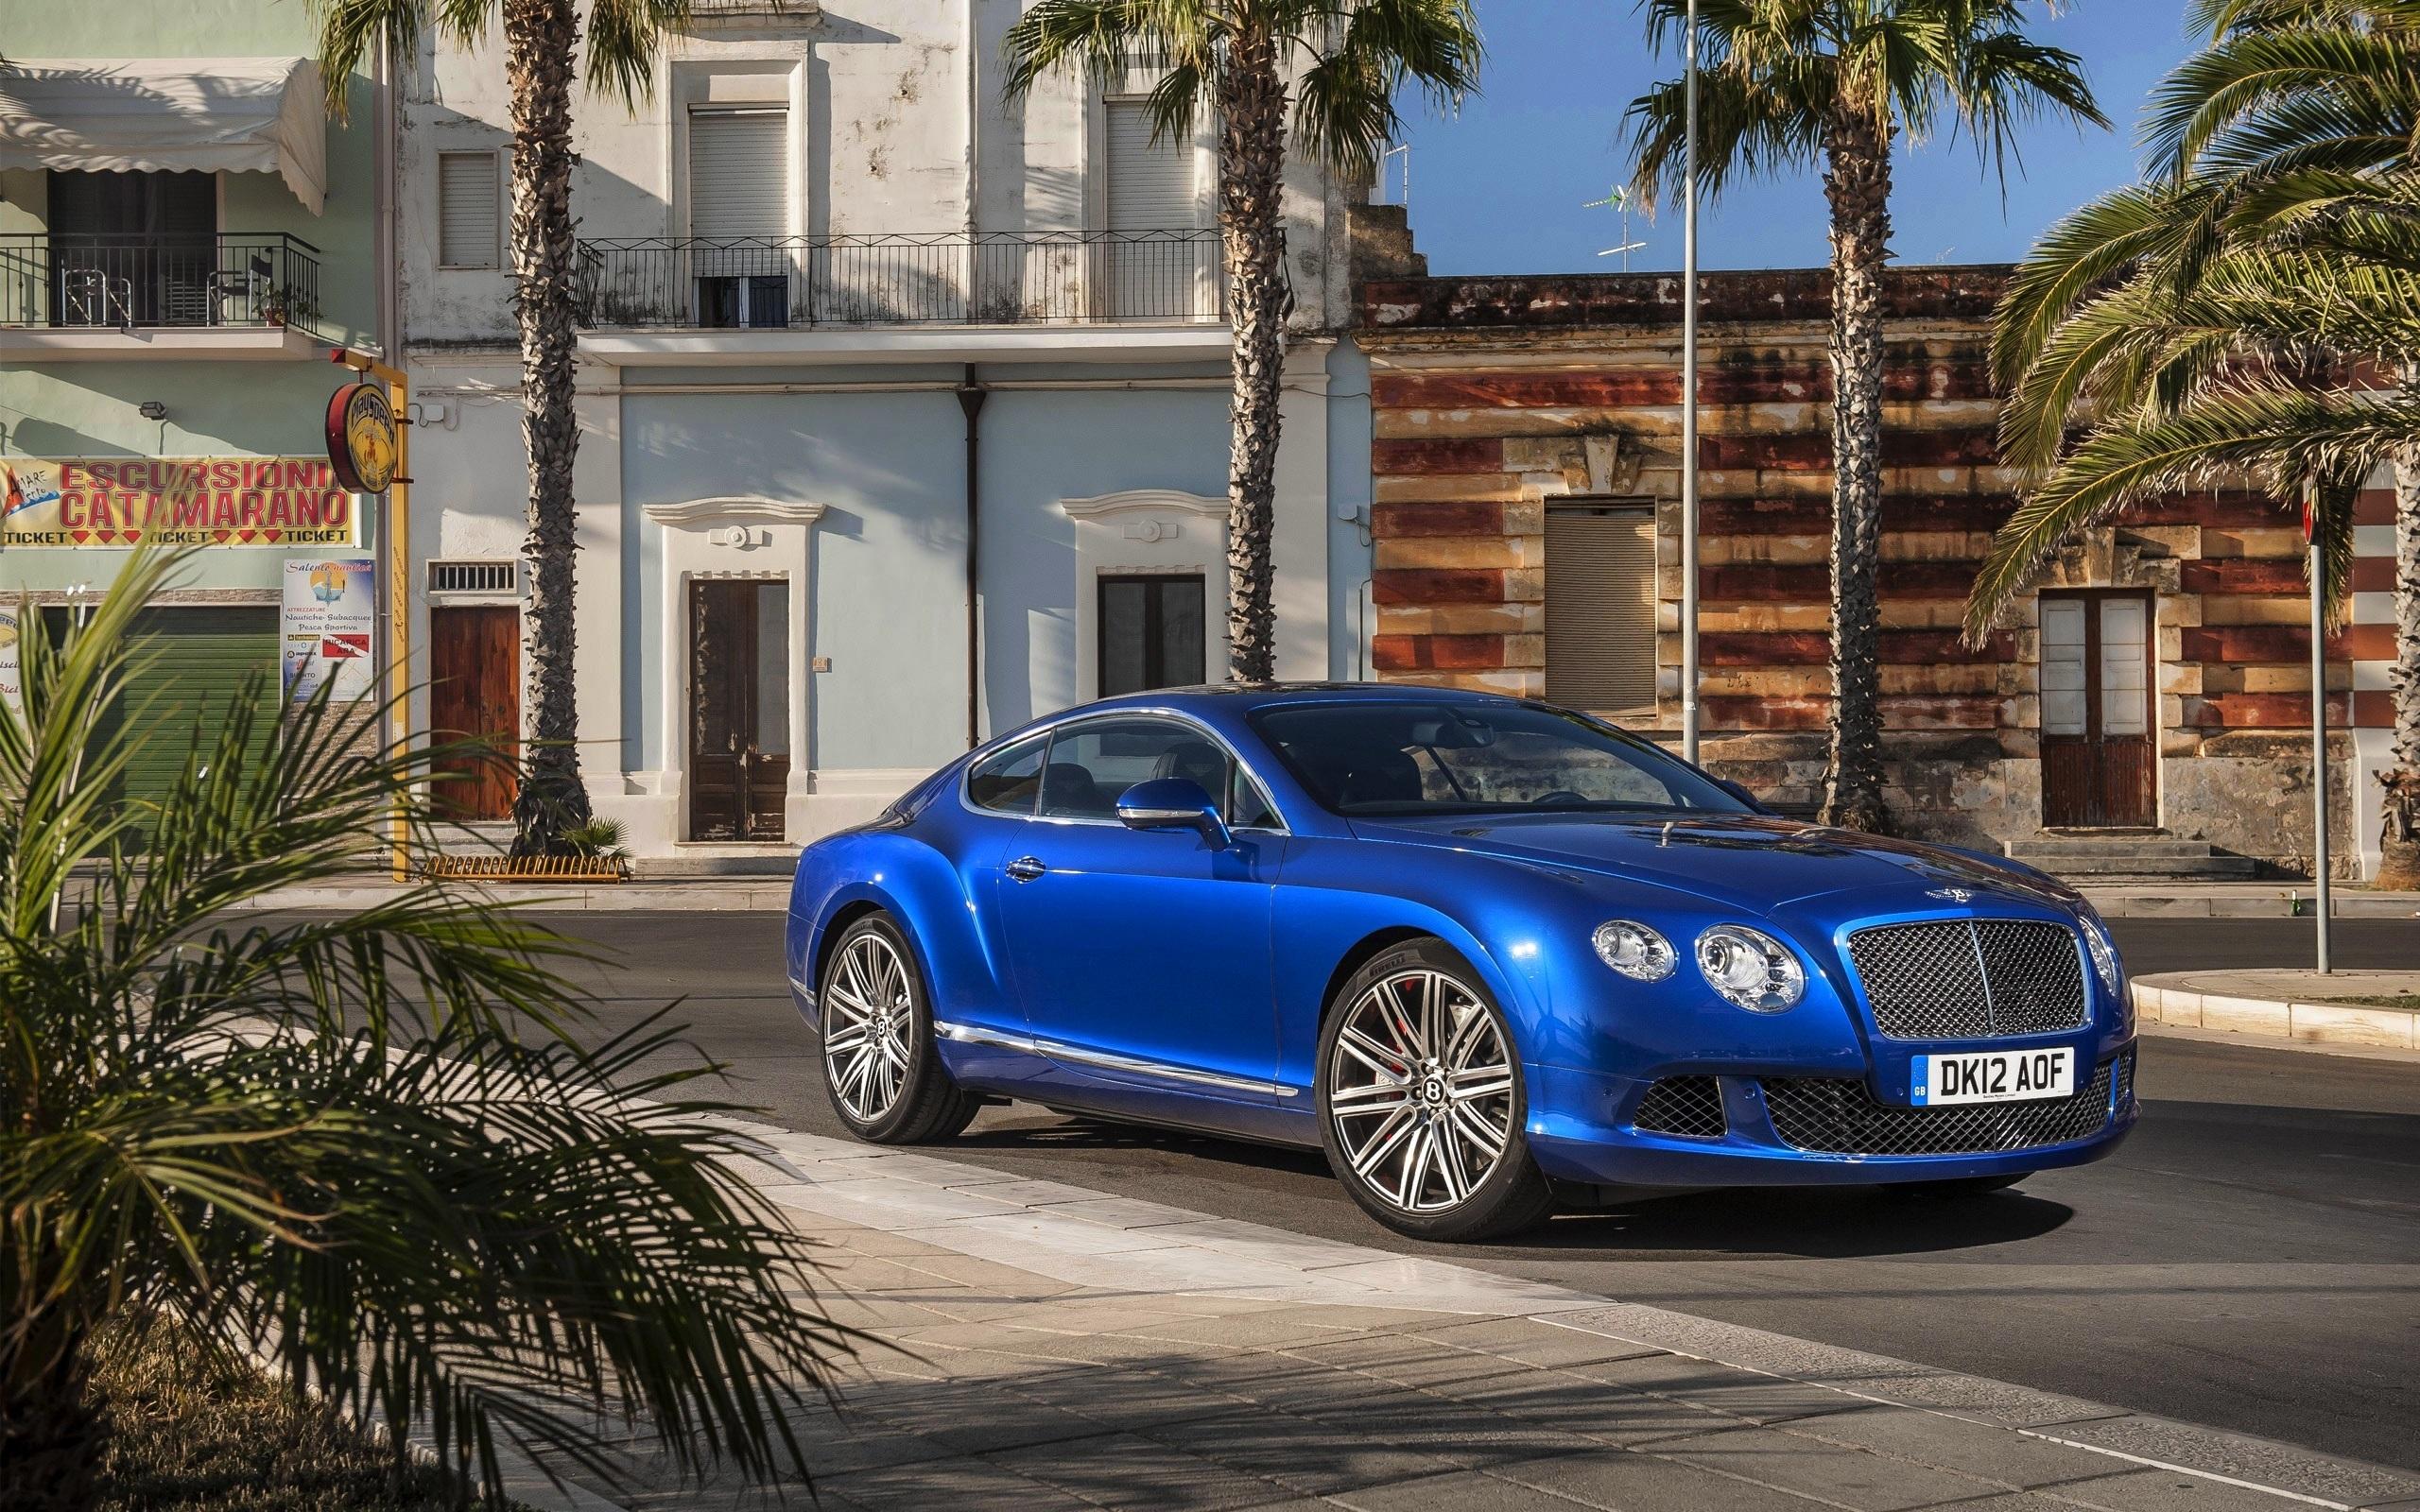 Wallpaper Bentley Continental GT blue car, palm trees